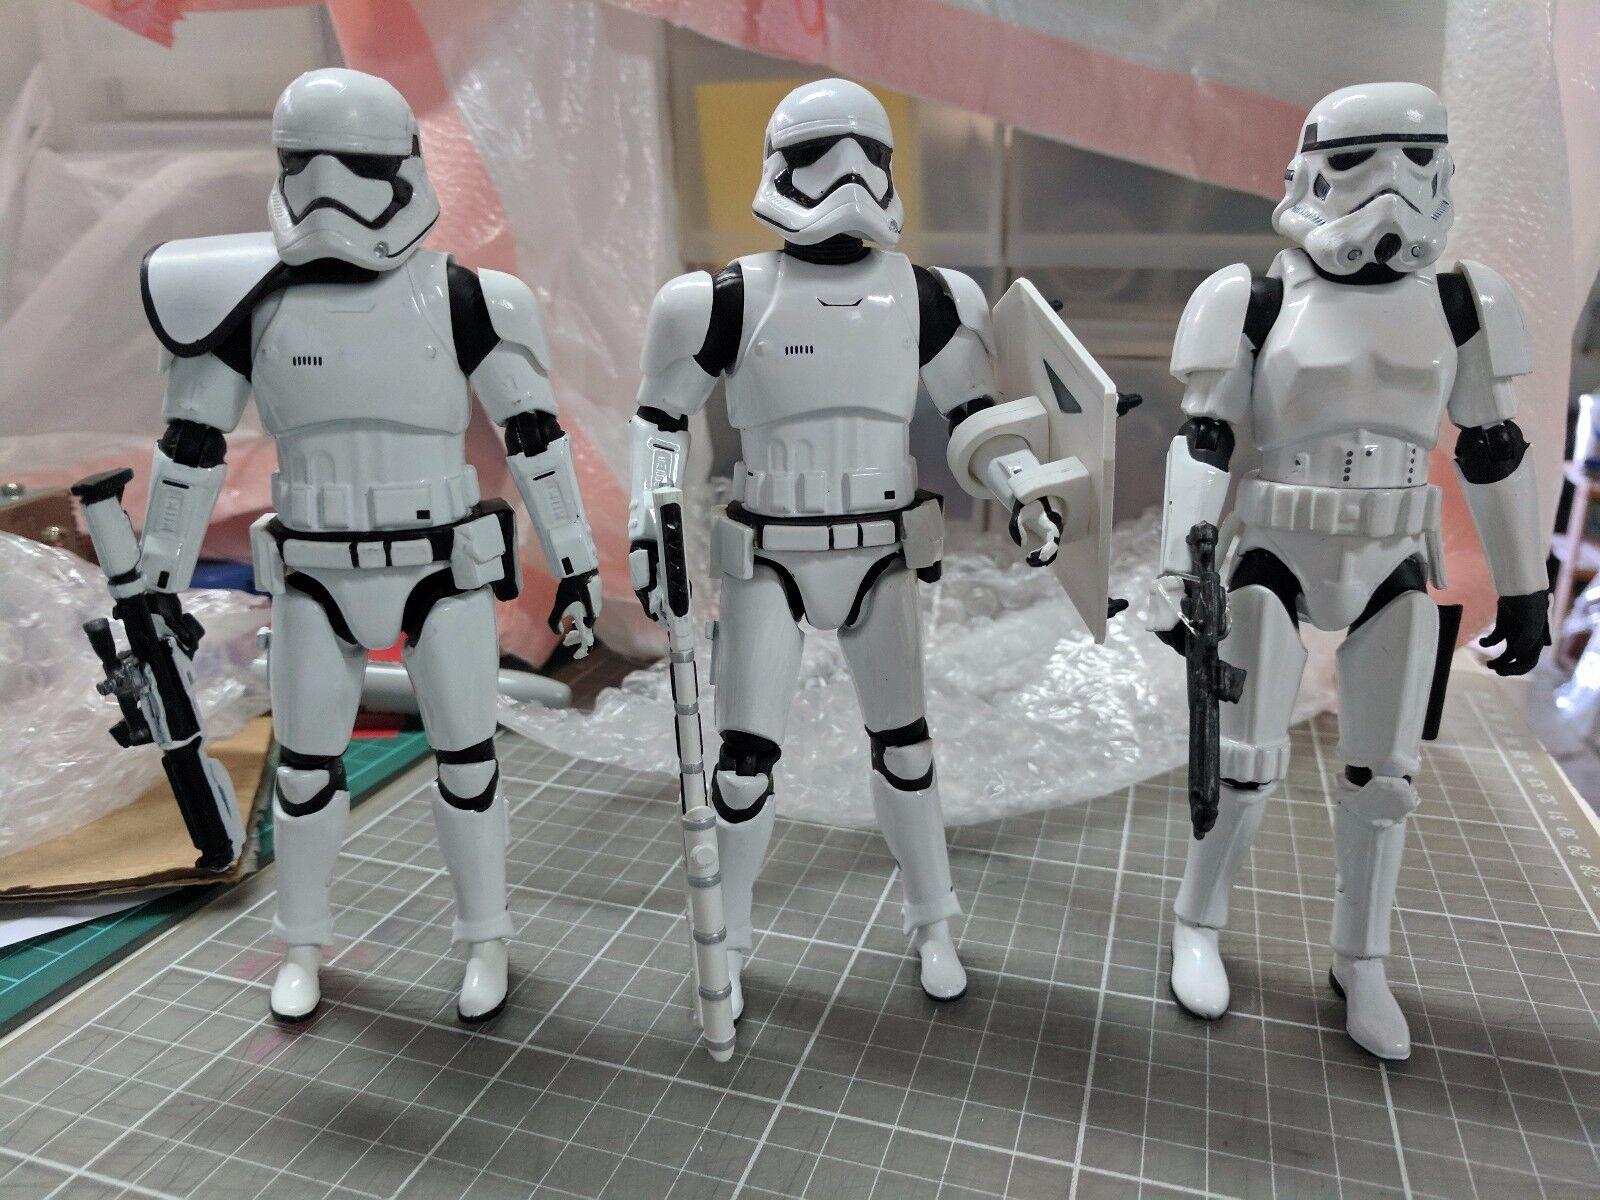 Star - wars - elite - serie spritzguss 6  erste Besteellung & classic stormtrooper satz 3